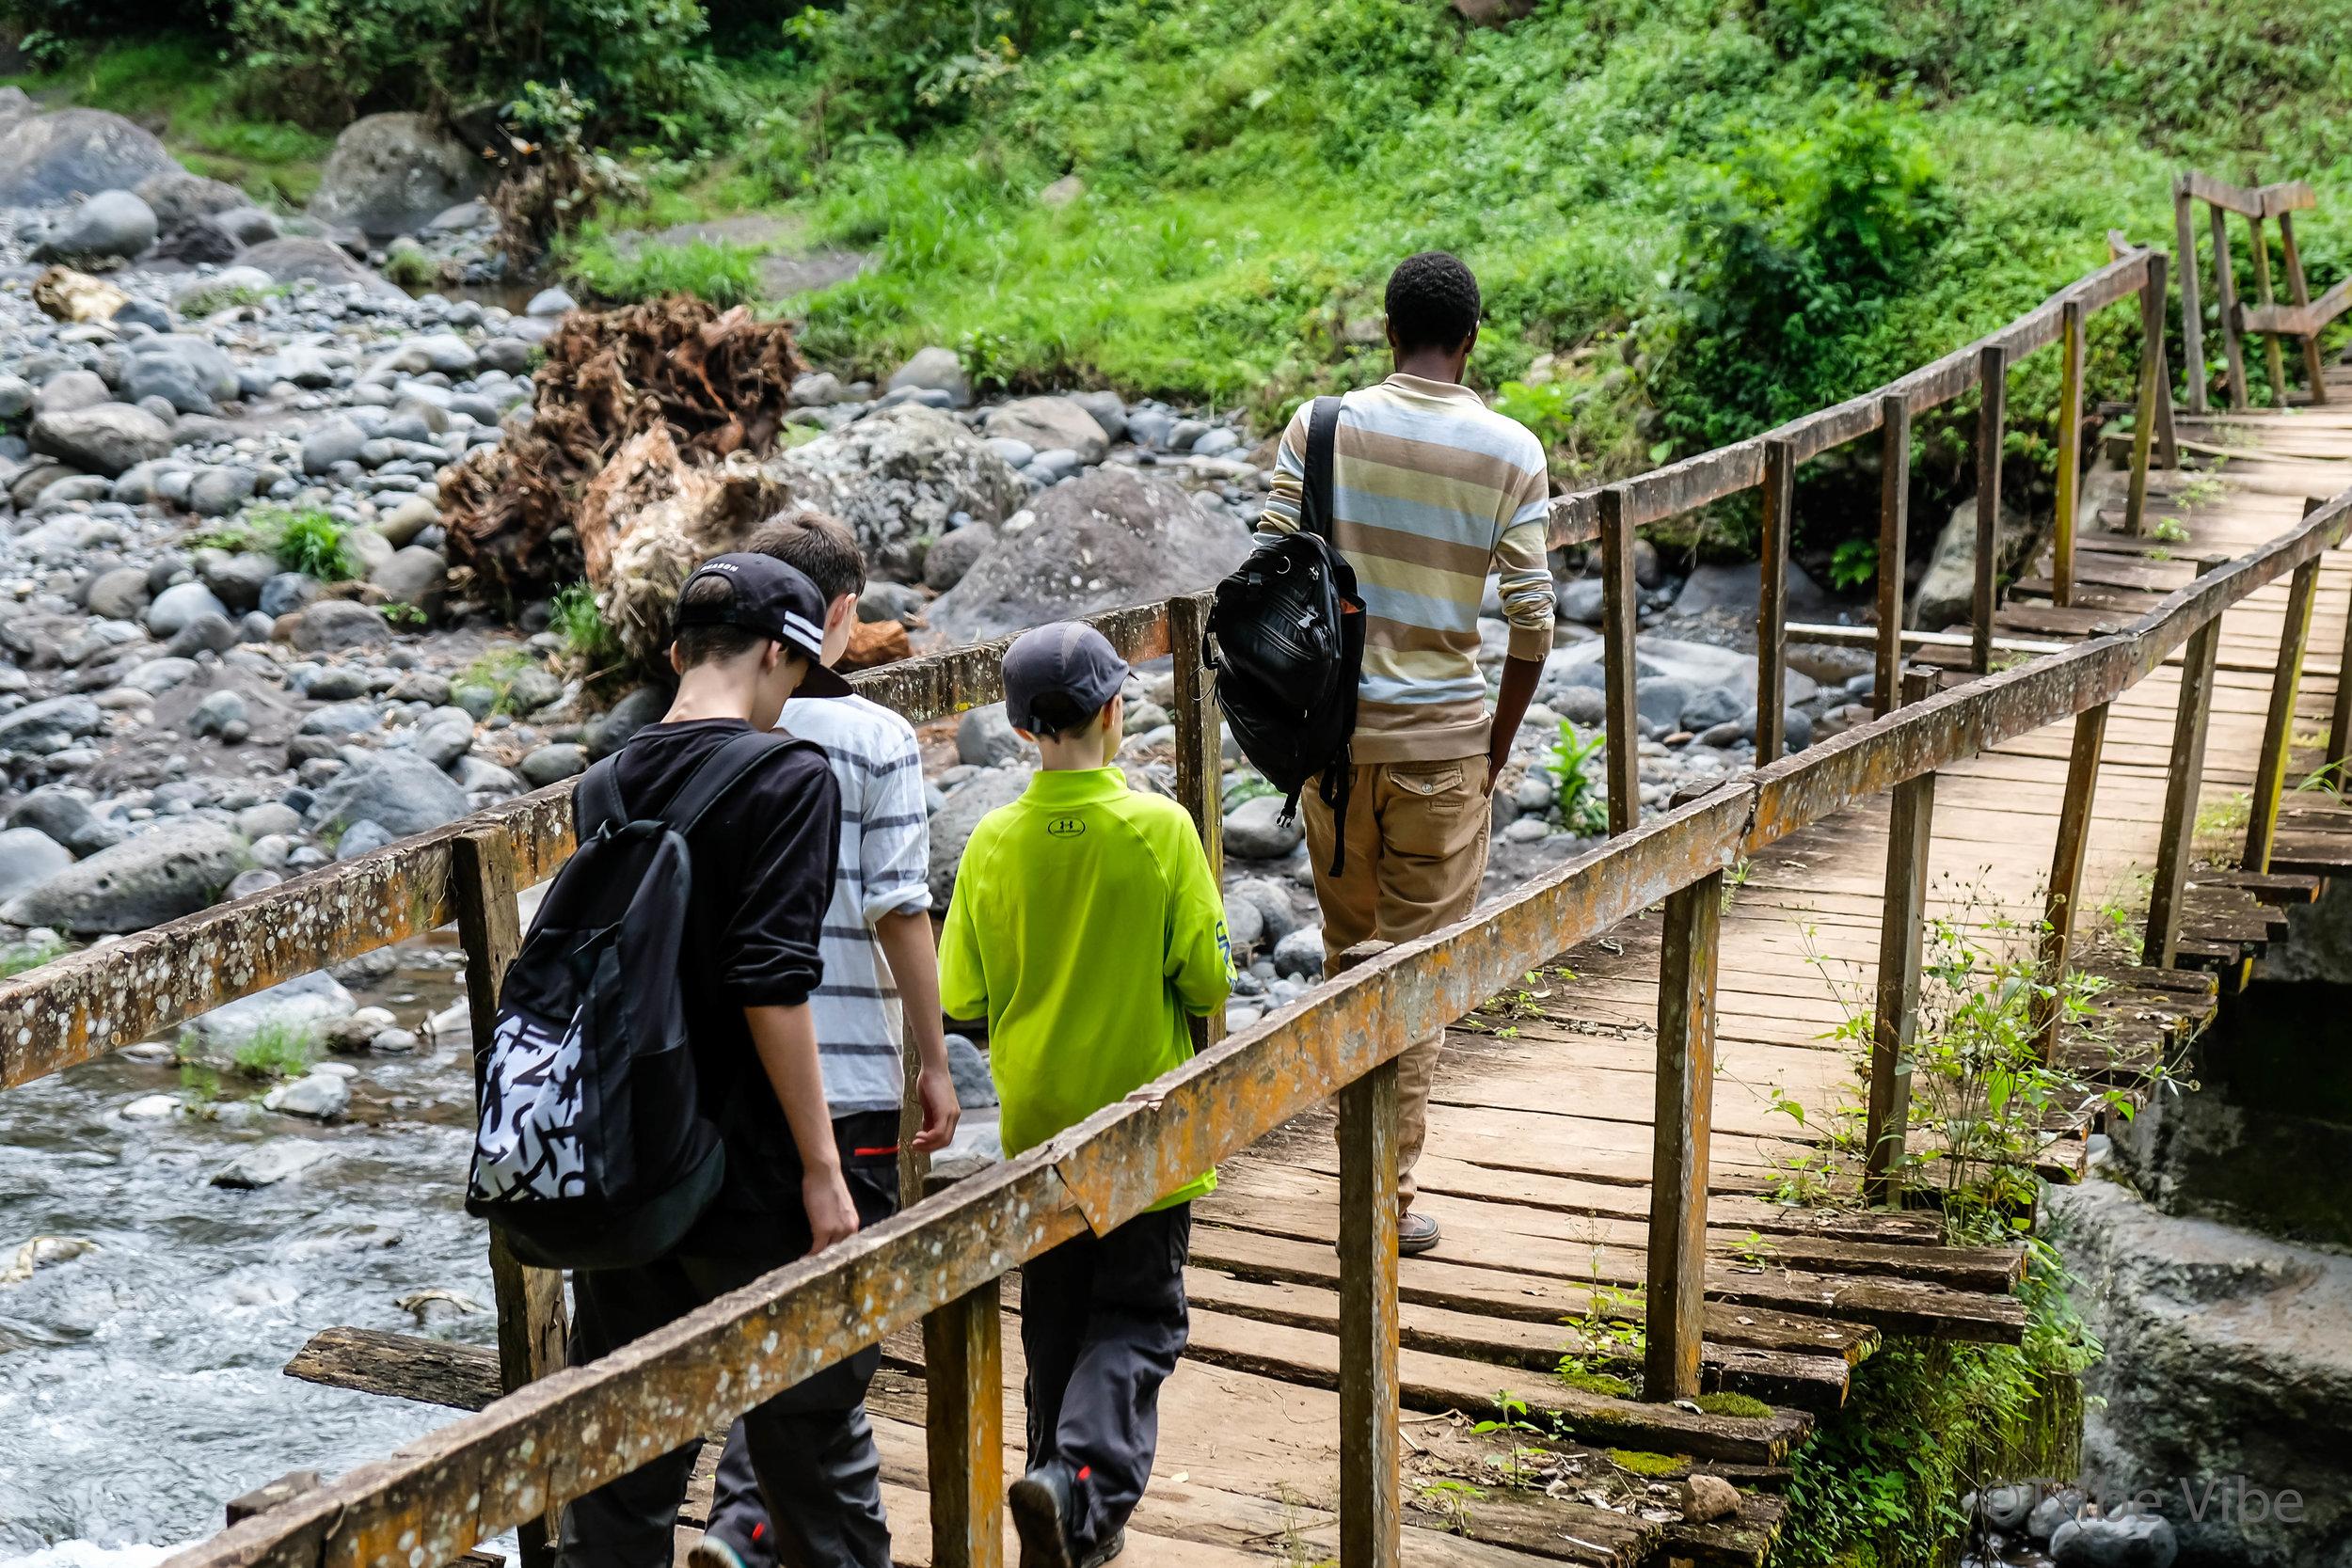 Machame walking trail to the bridge 3, Kilimanjaro.jpg